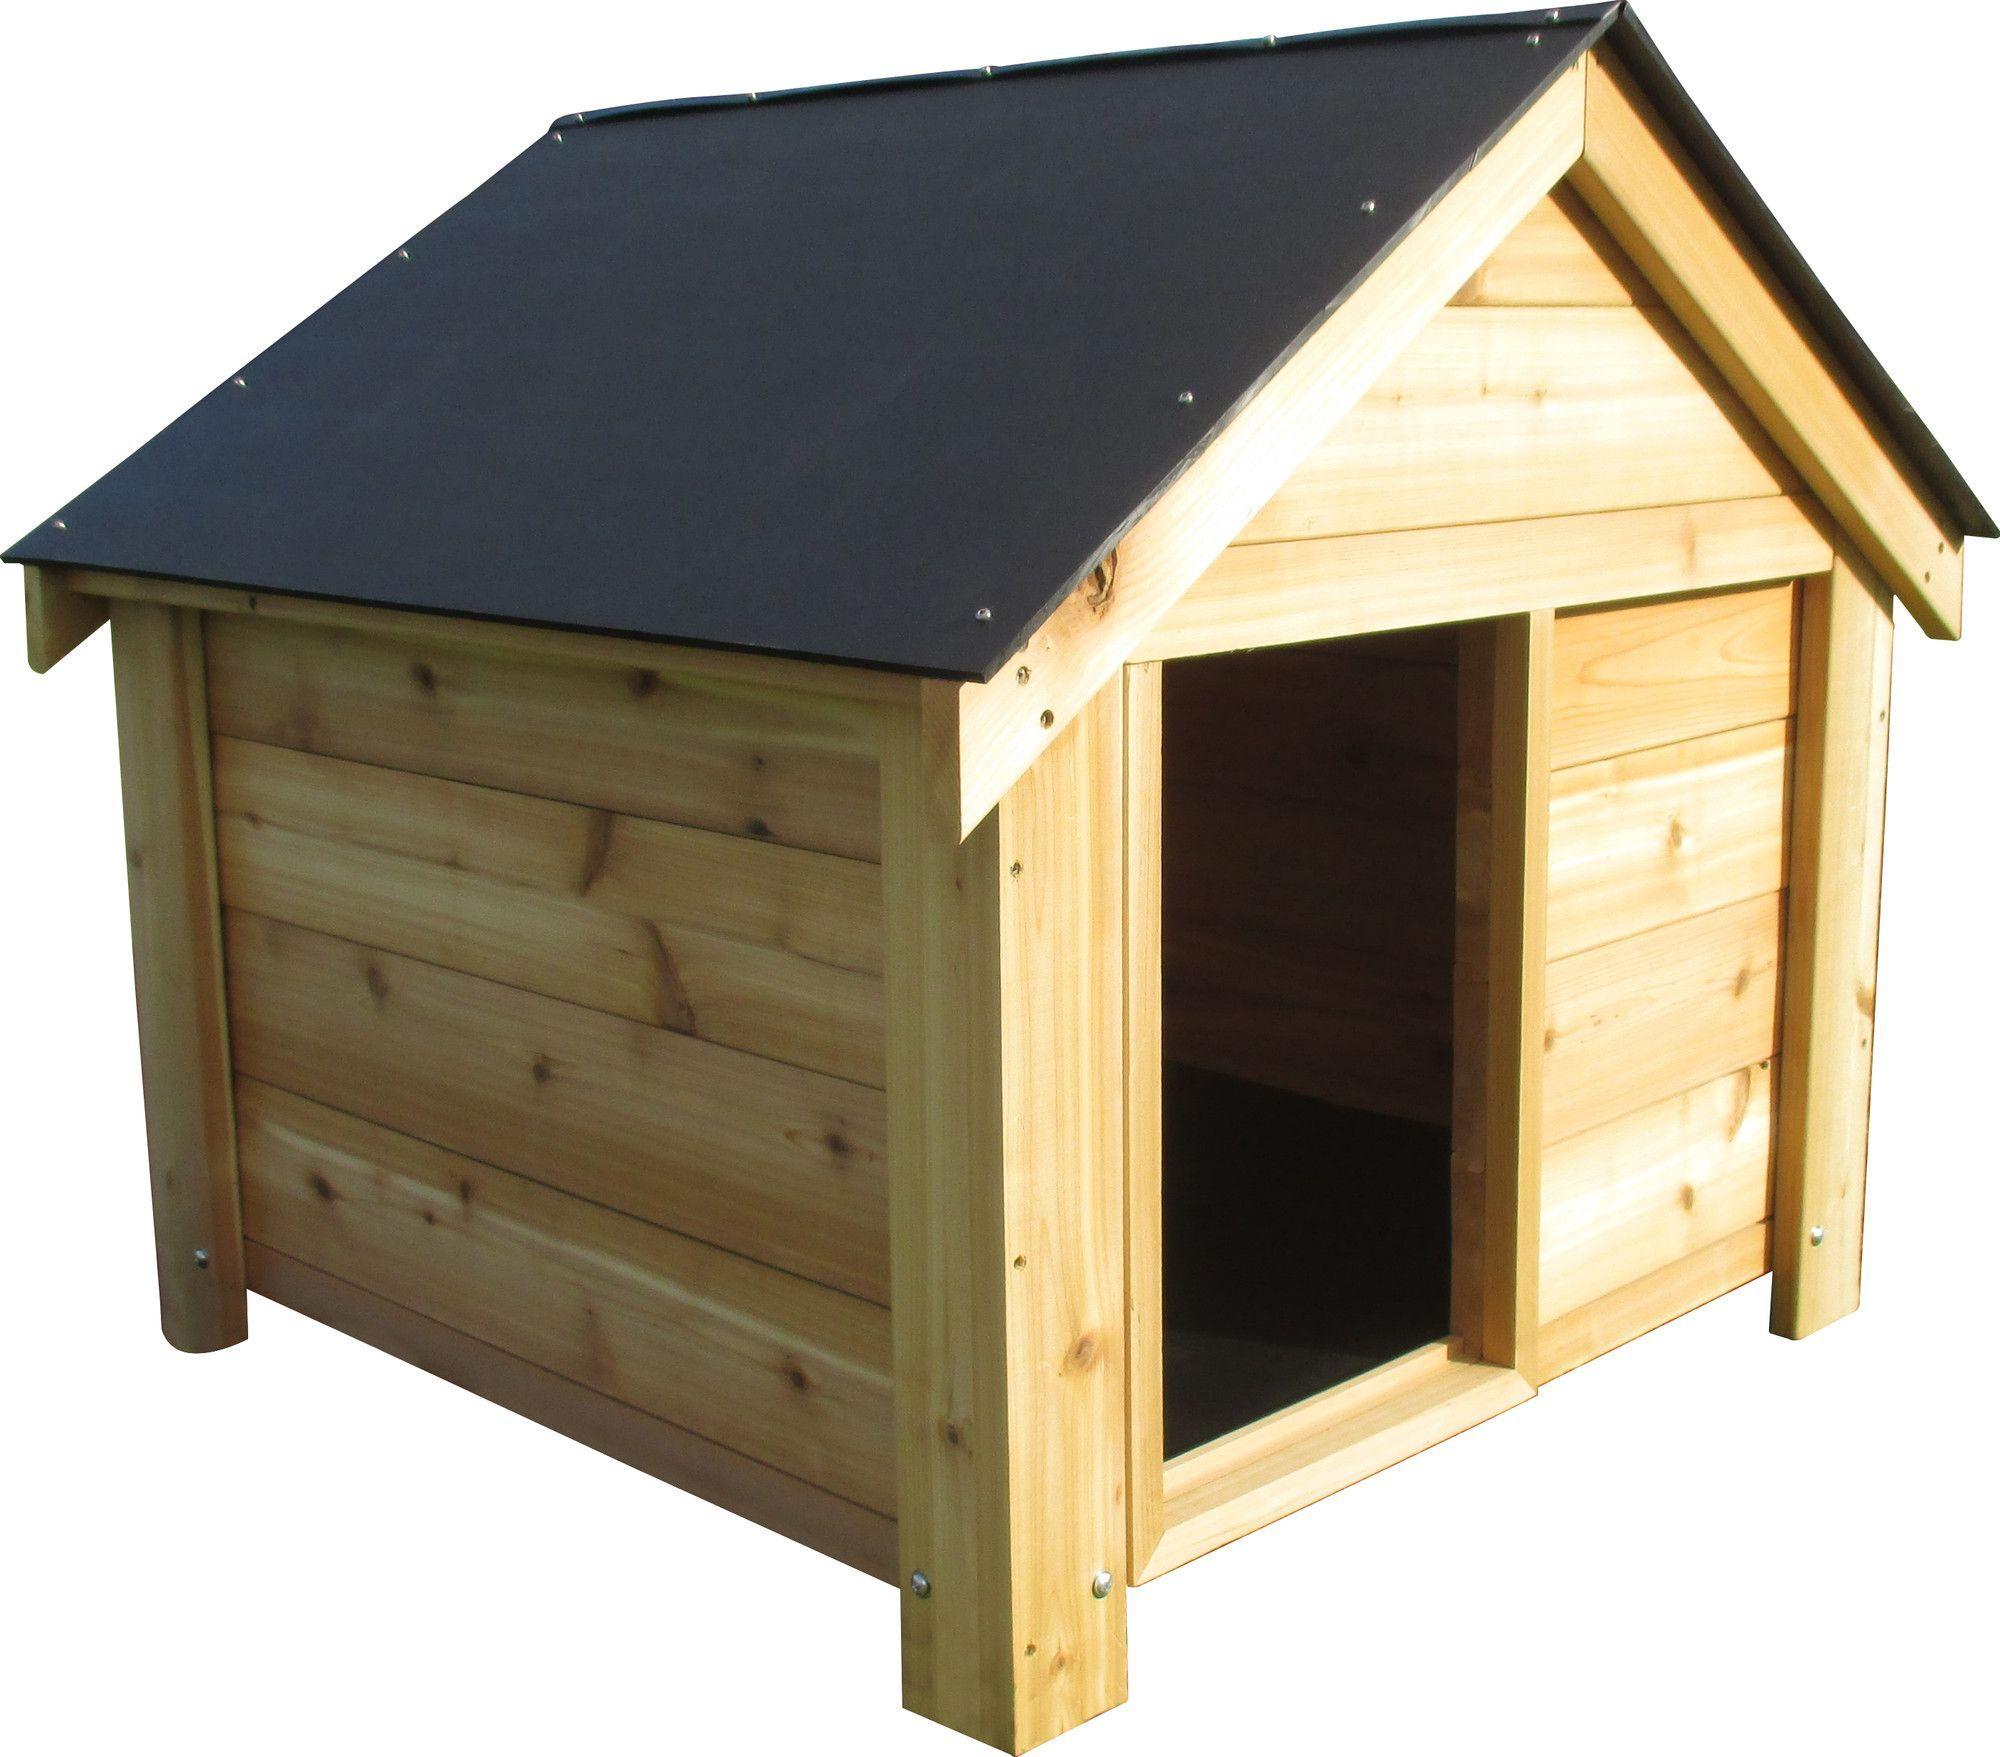 Infinitecedar The Ultimate Dog House Insulated Dog House Dog Houses Dog House Diy